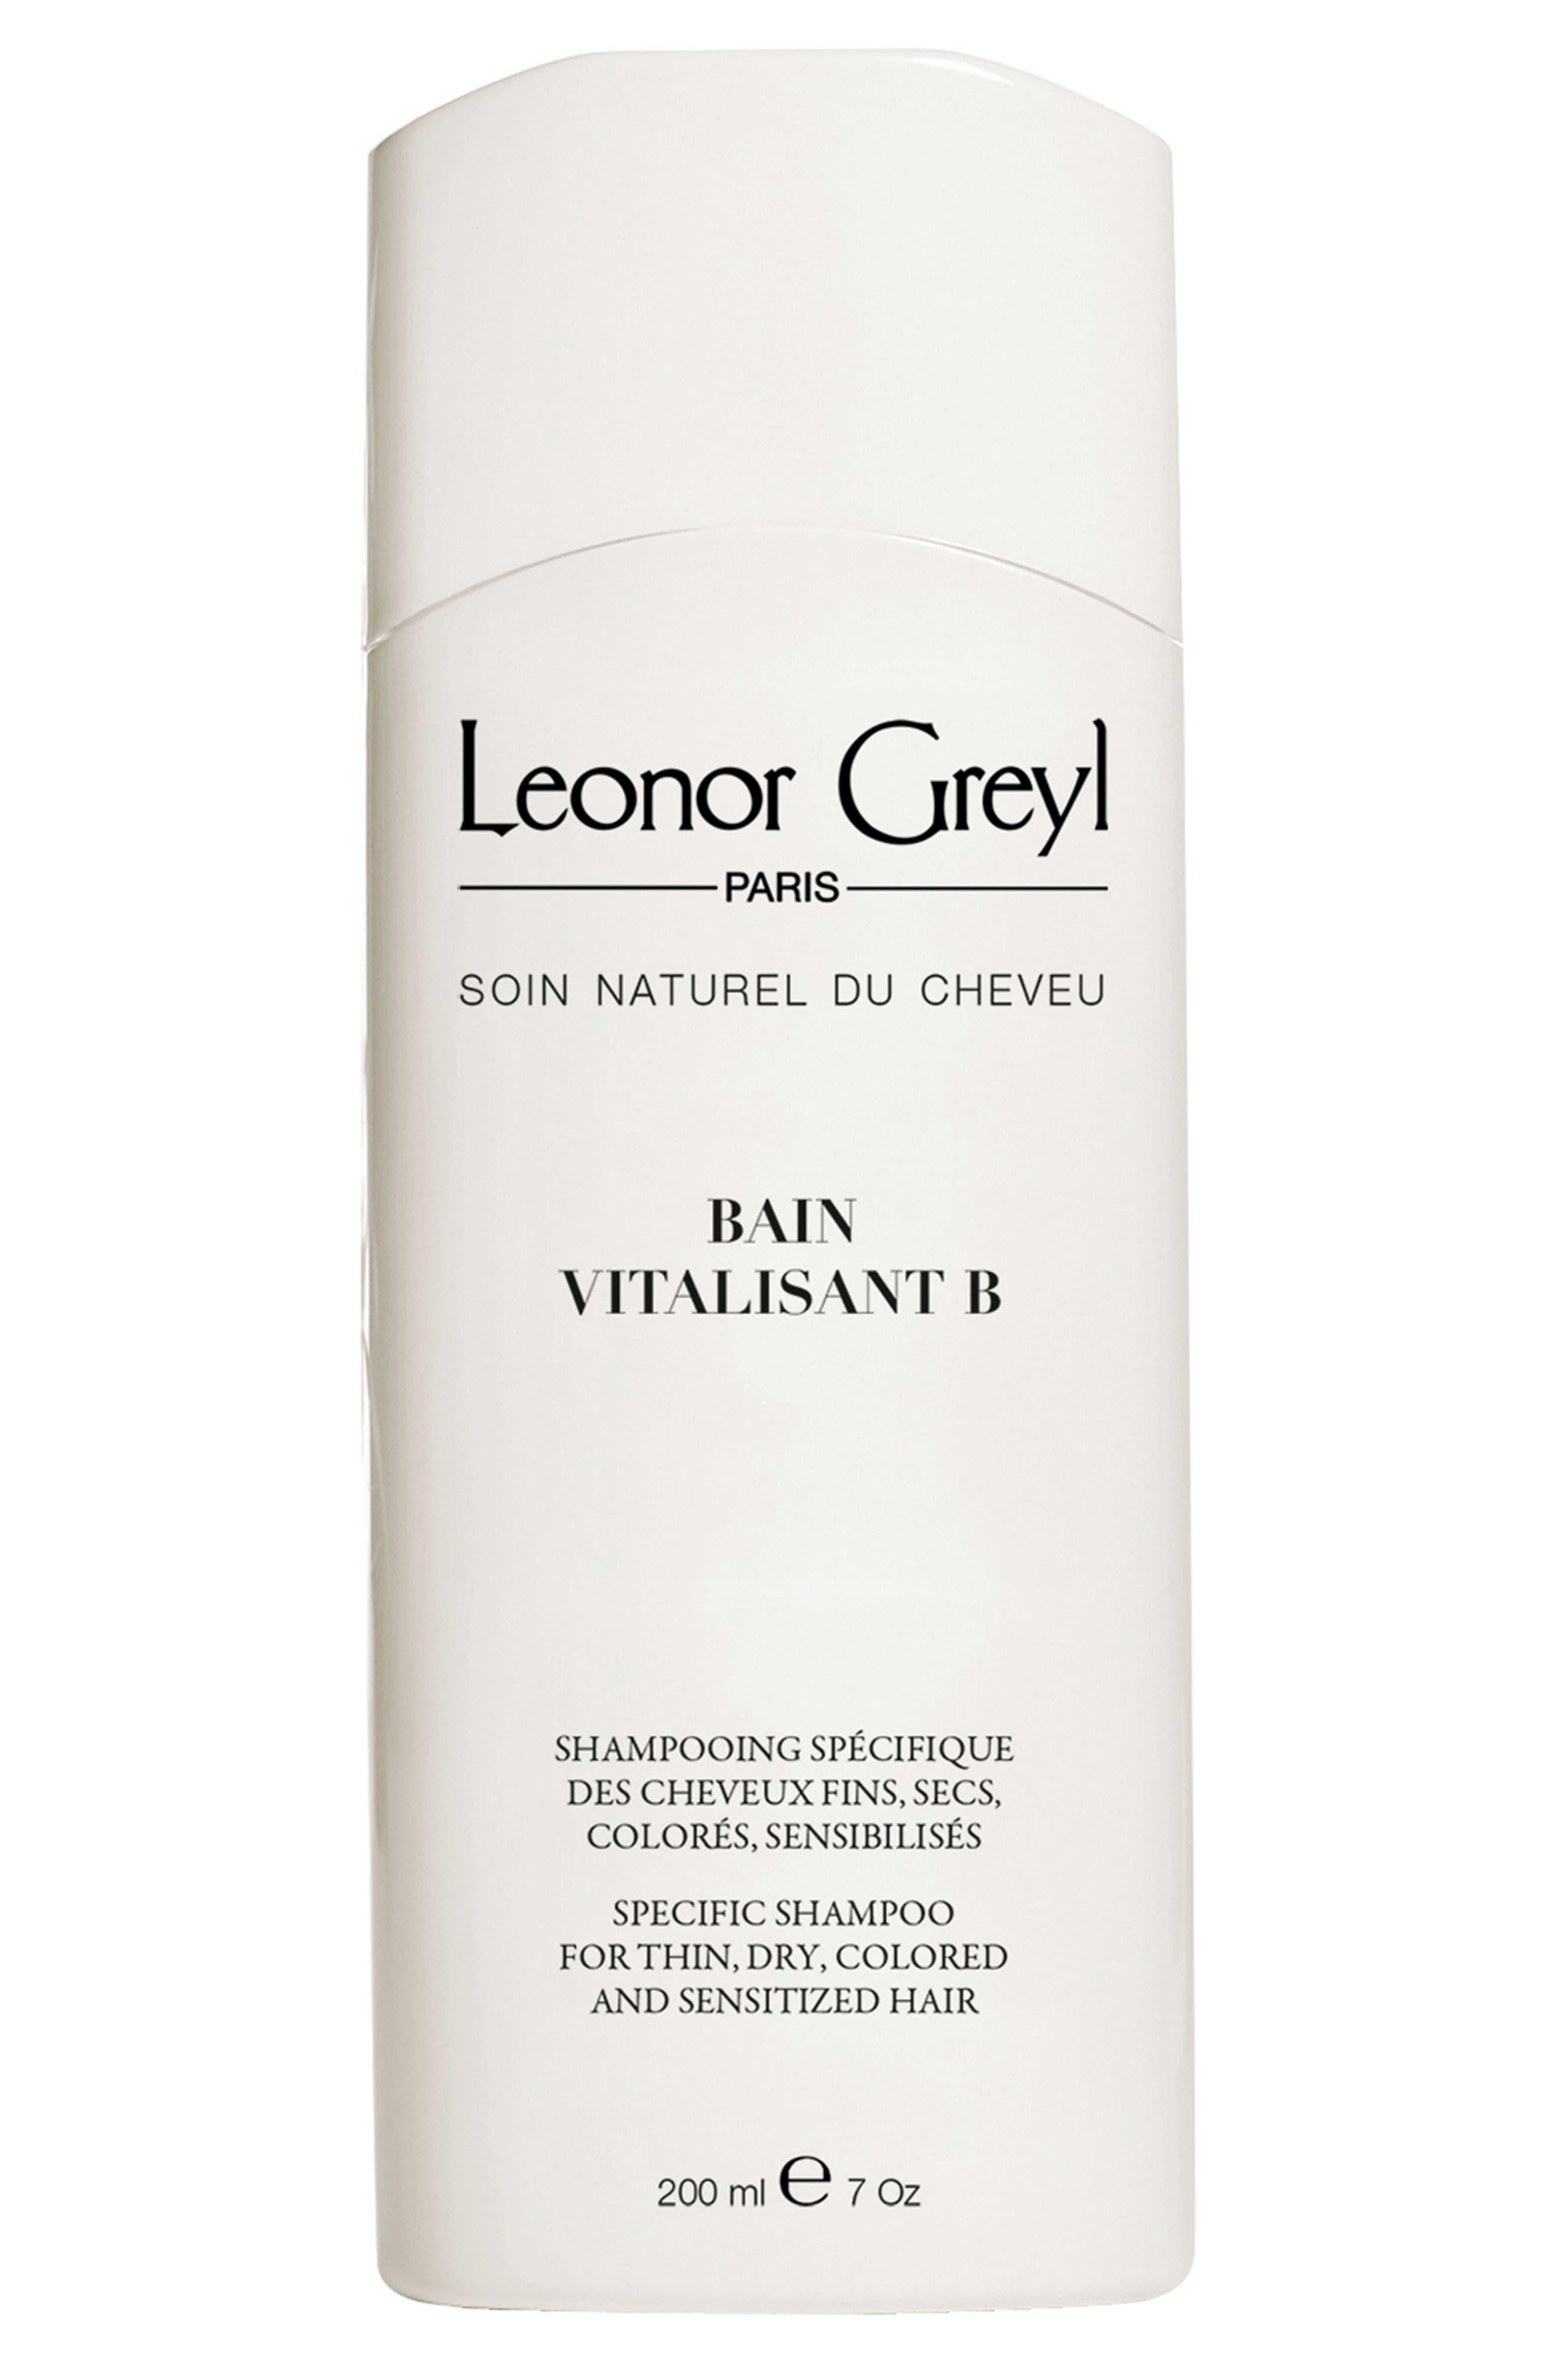 Leonor Greyl PARIS 'Vitalisant B' Shampoo